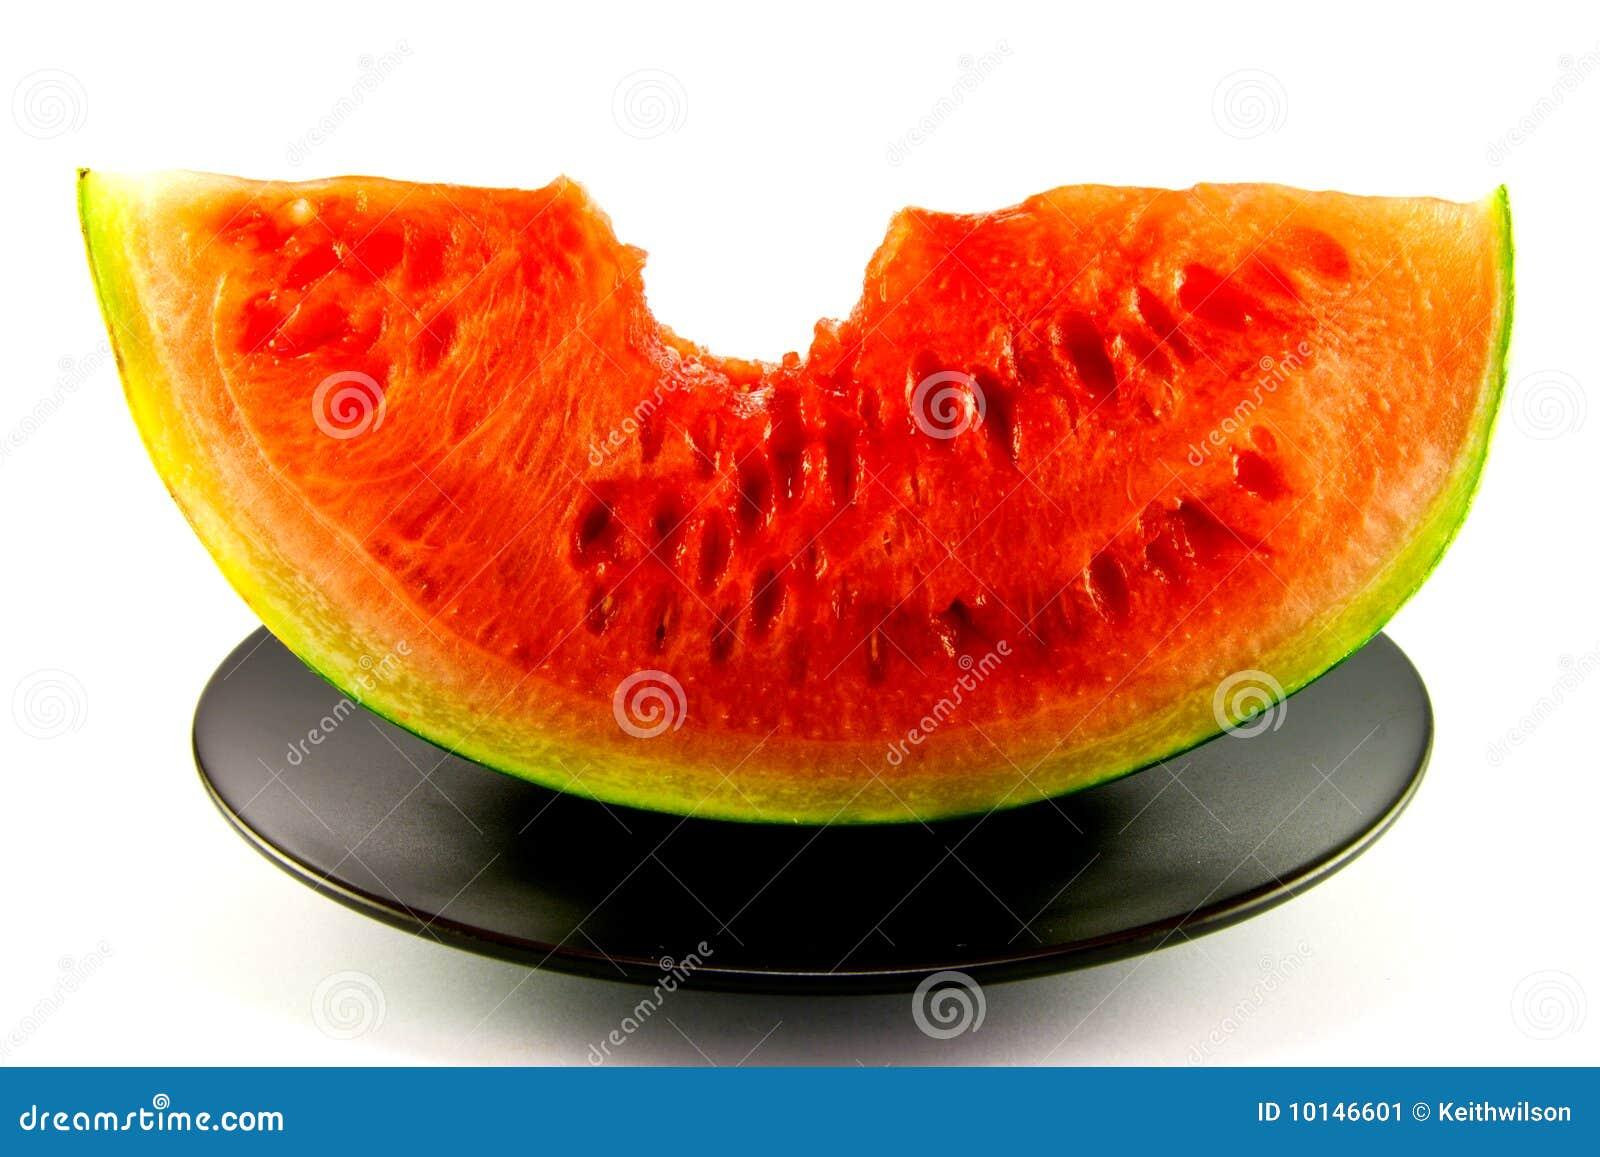 Watermelon with Bite Mark